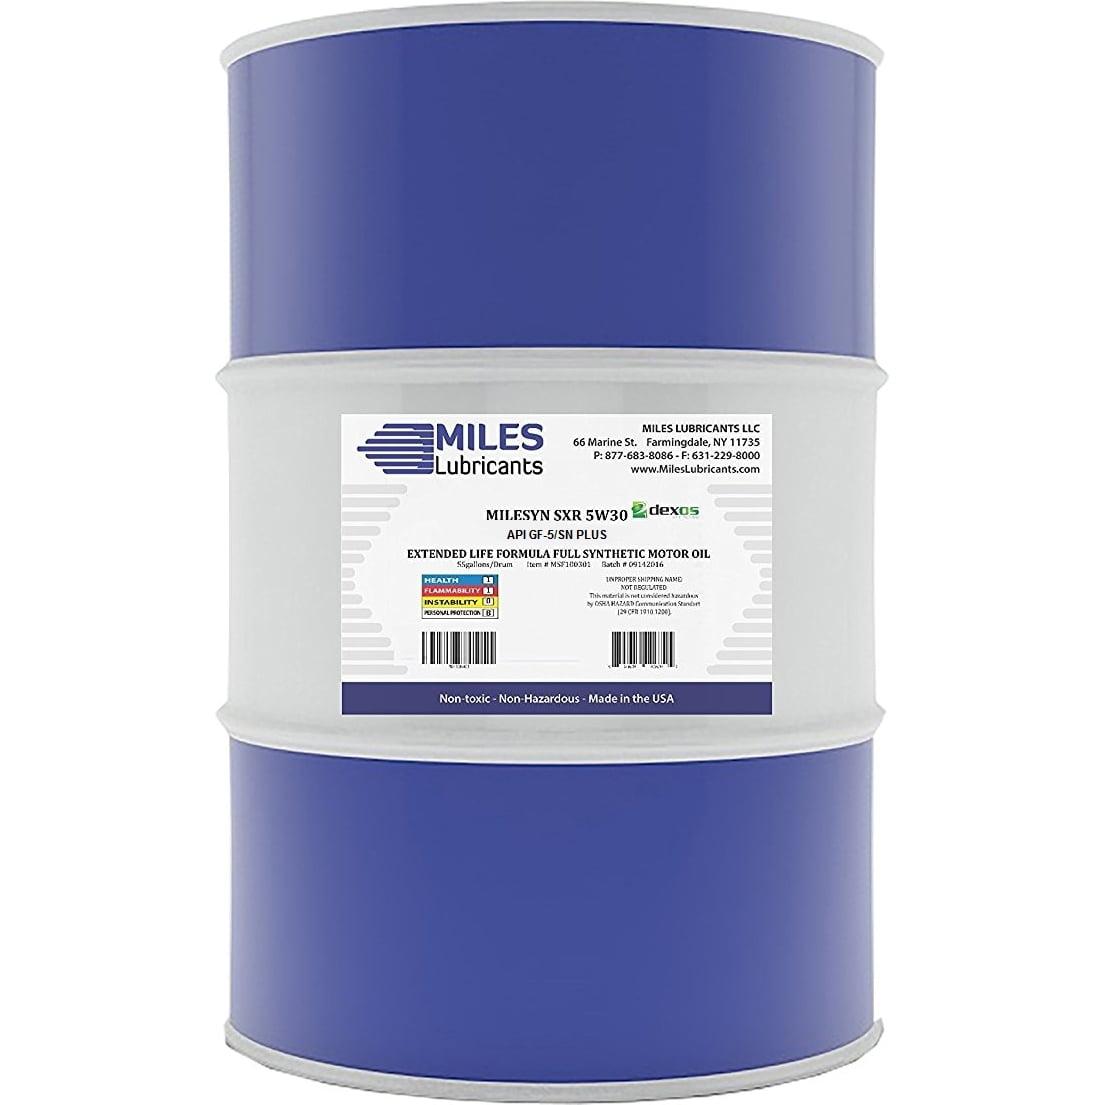 Milesyn SXR 5W30 API GF-5/SN, Dexos1, Full Synthetic Motor Oil, 55-Gallon Drum